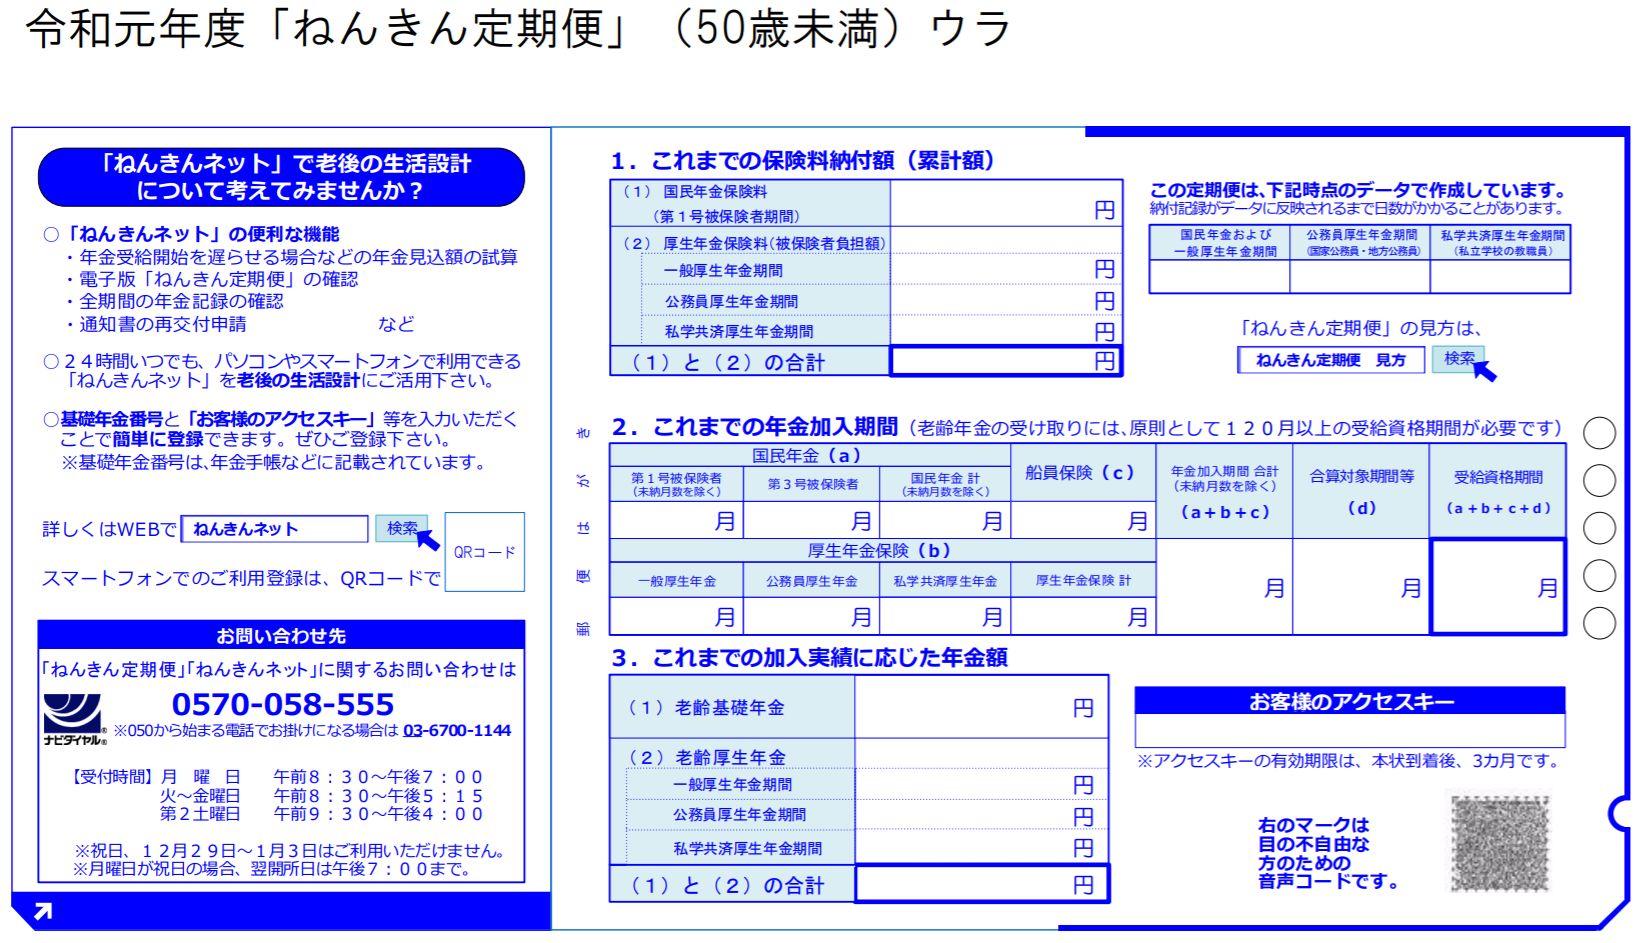 pension_under_50-01